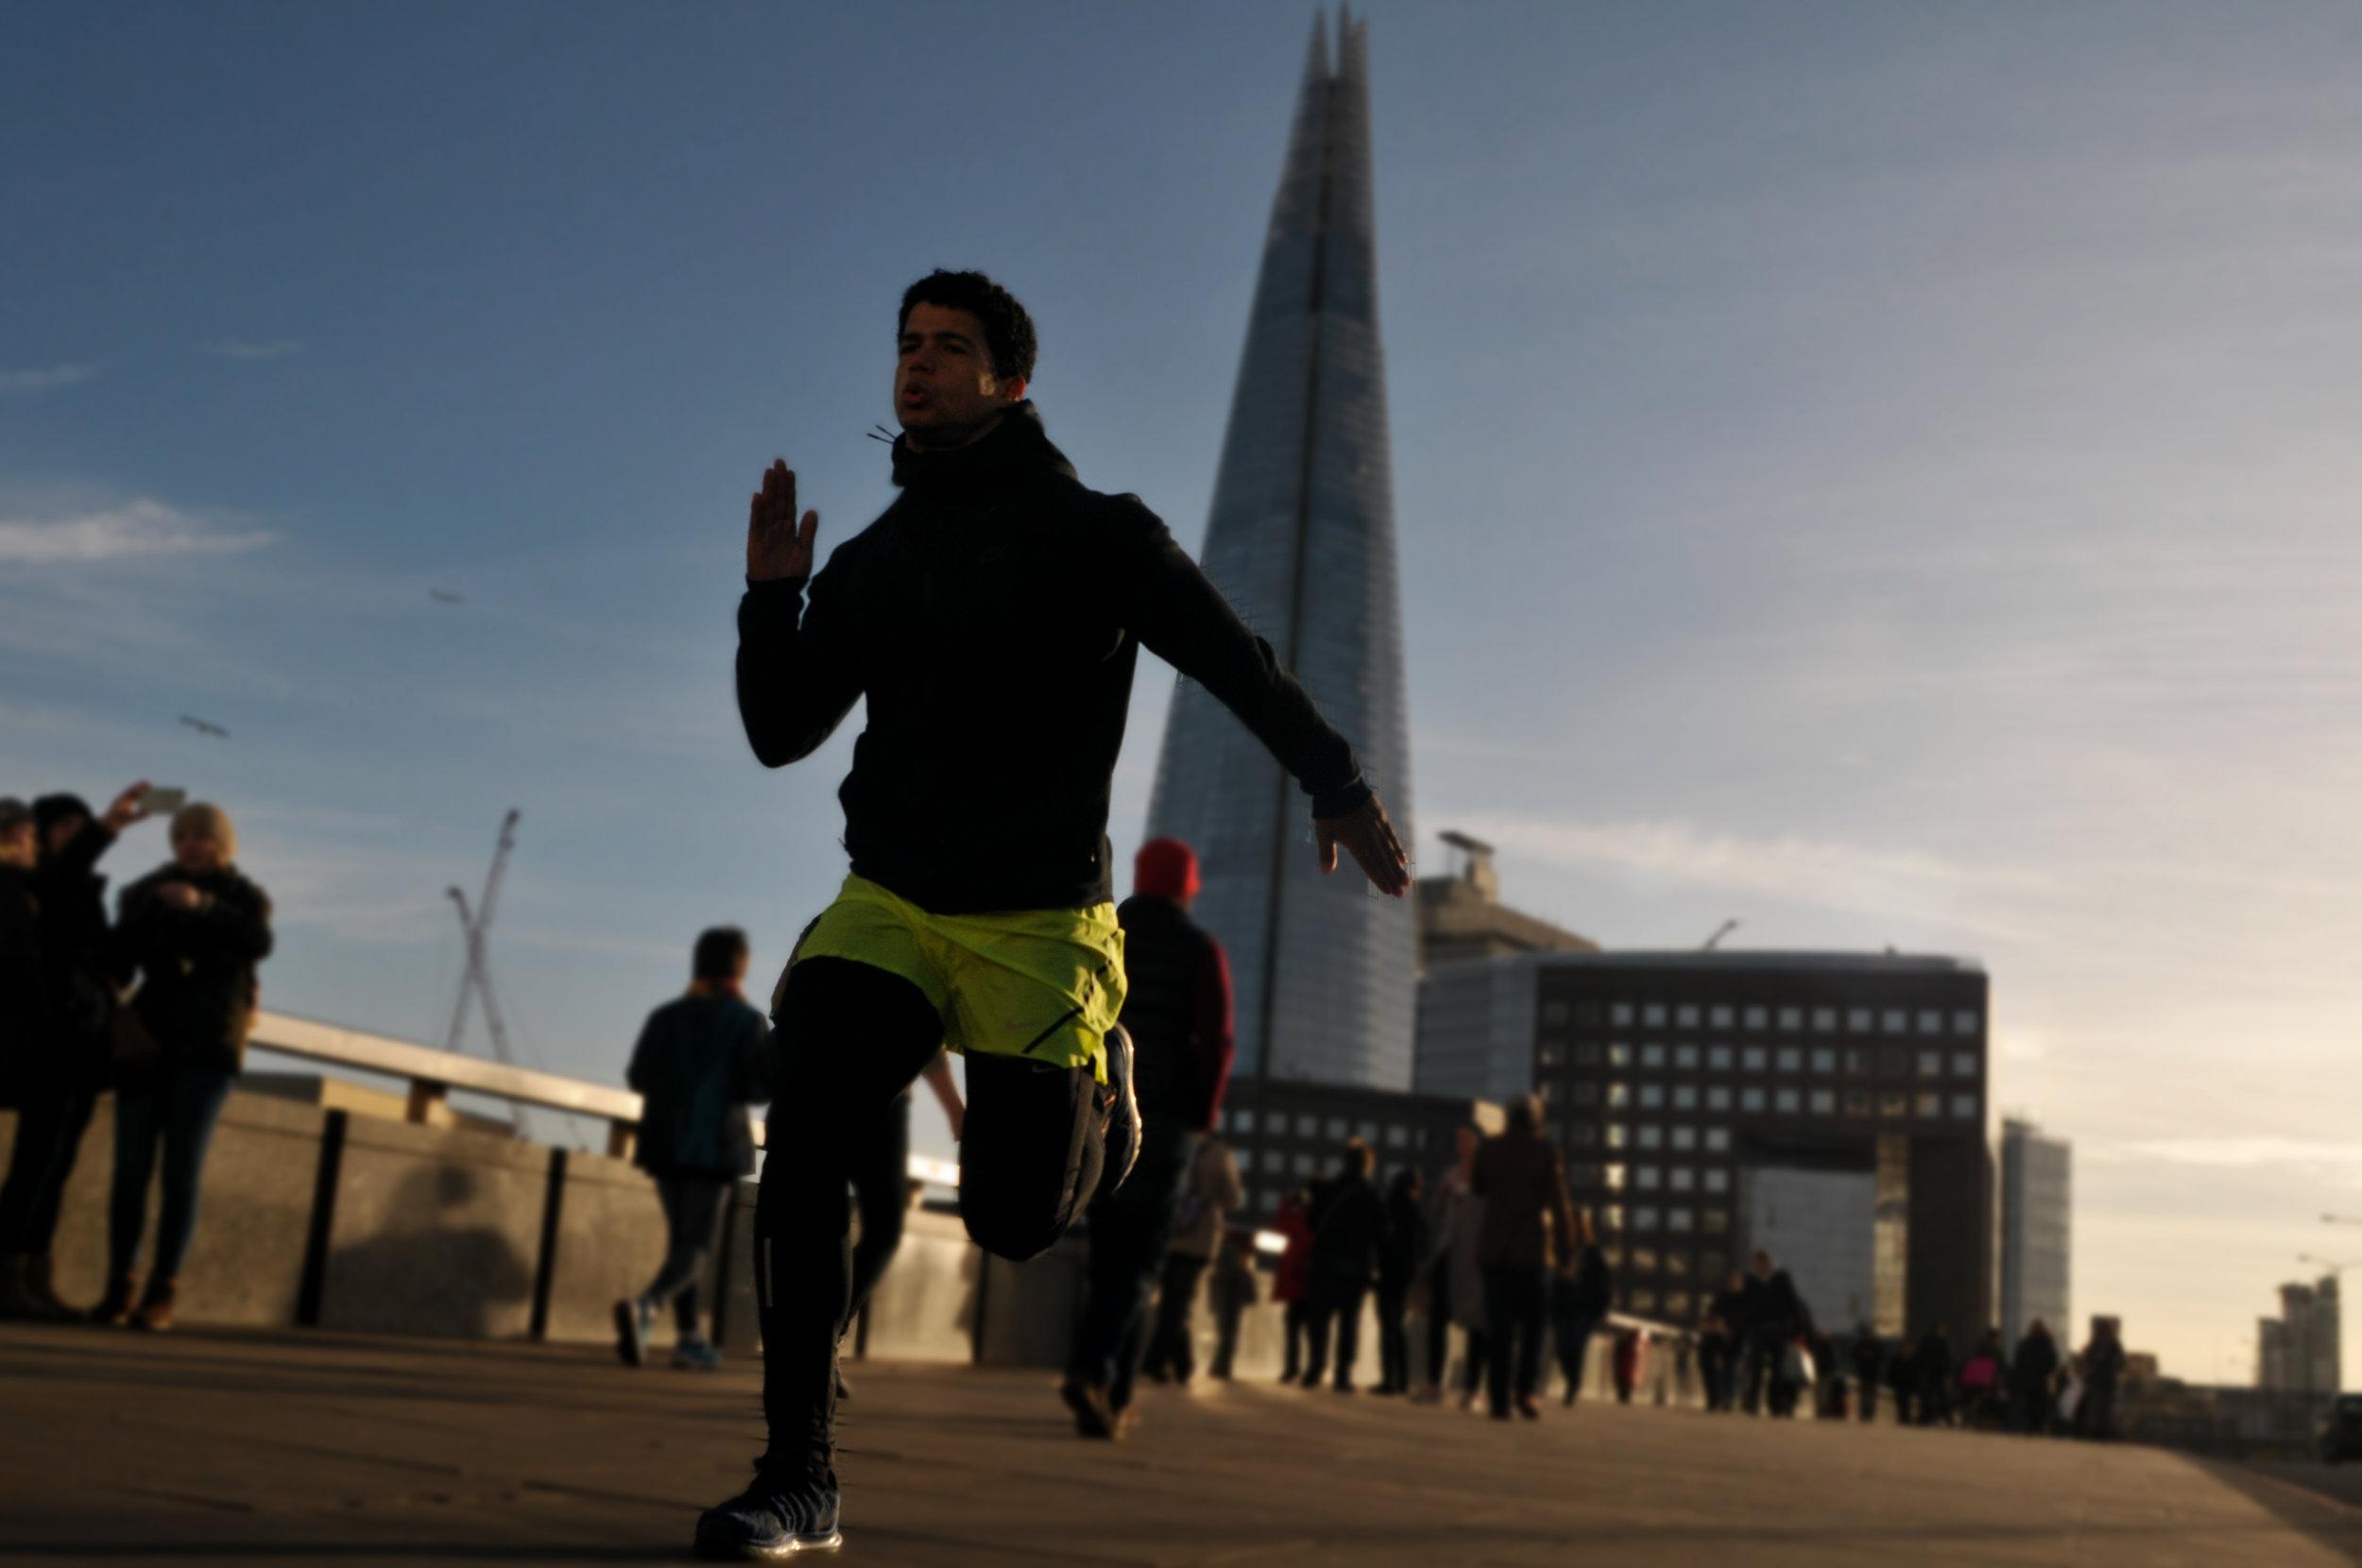 Personal Trainer London Bridge Samuel Figueroa.jpg